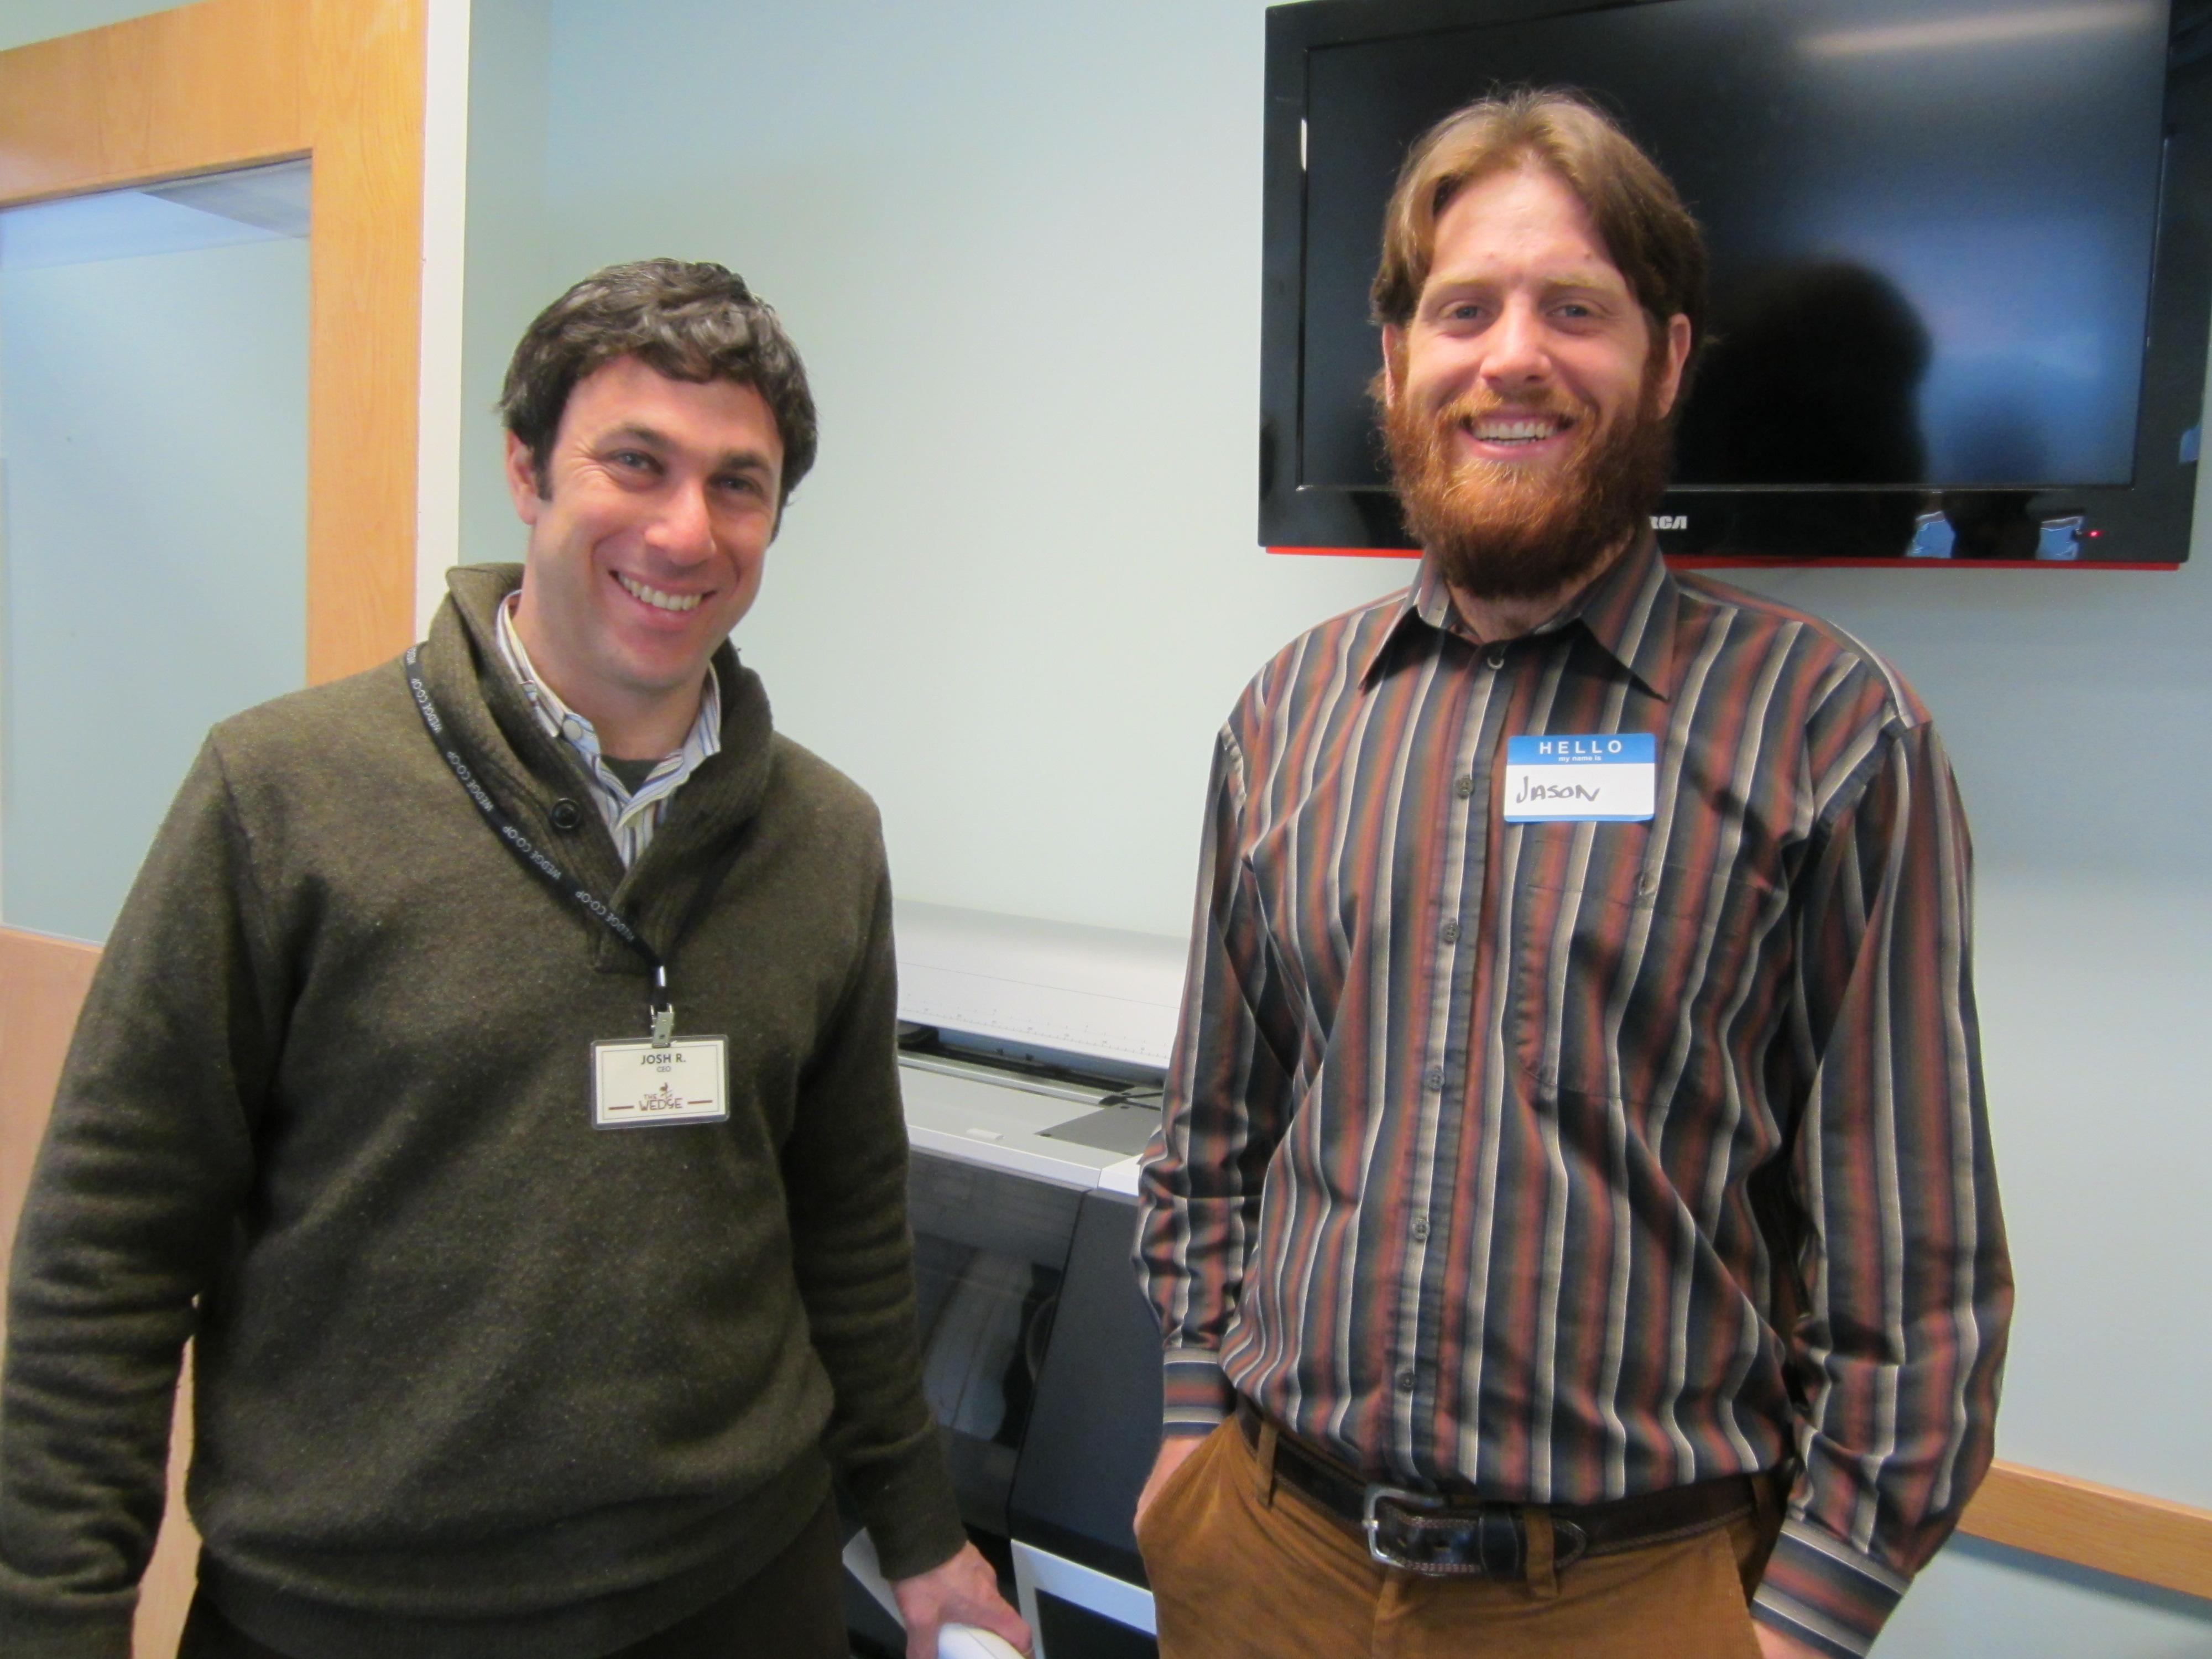 Wedge CEO Josh Resnik and Jason Tanzman, Cycles for Change